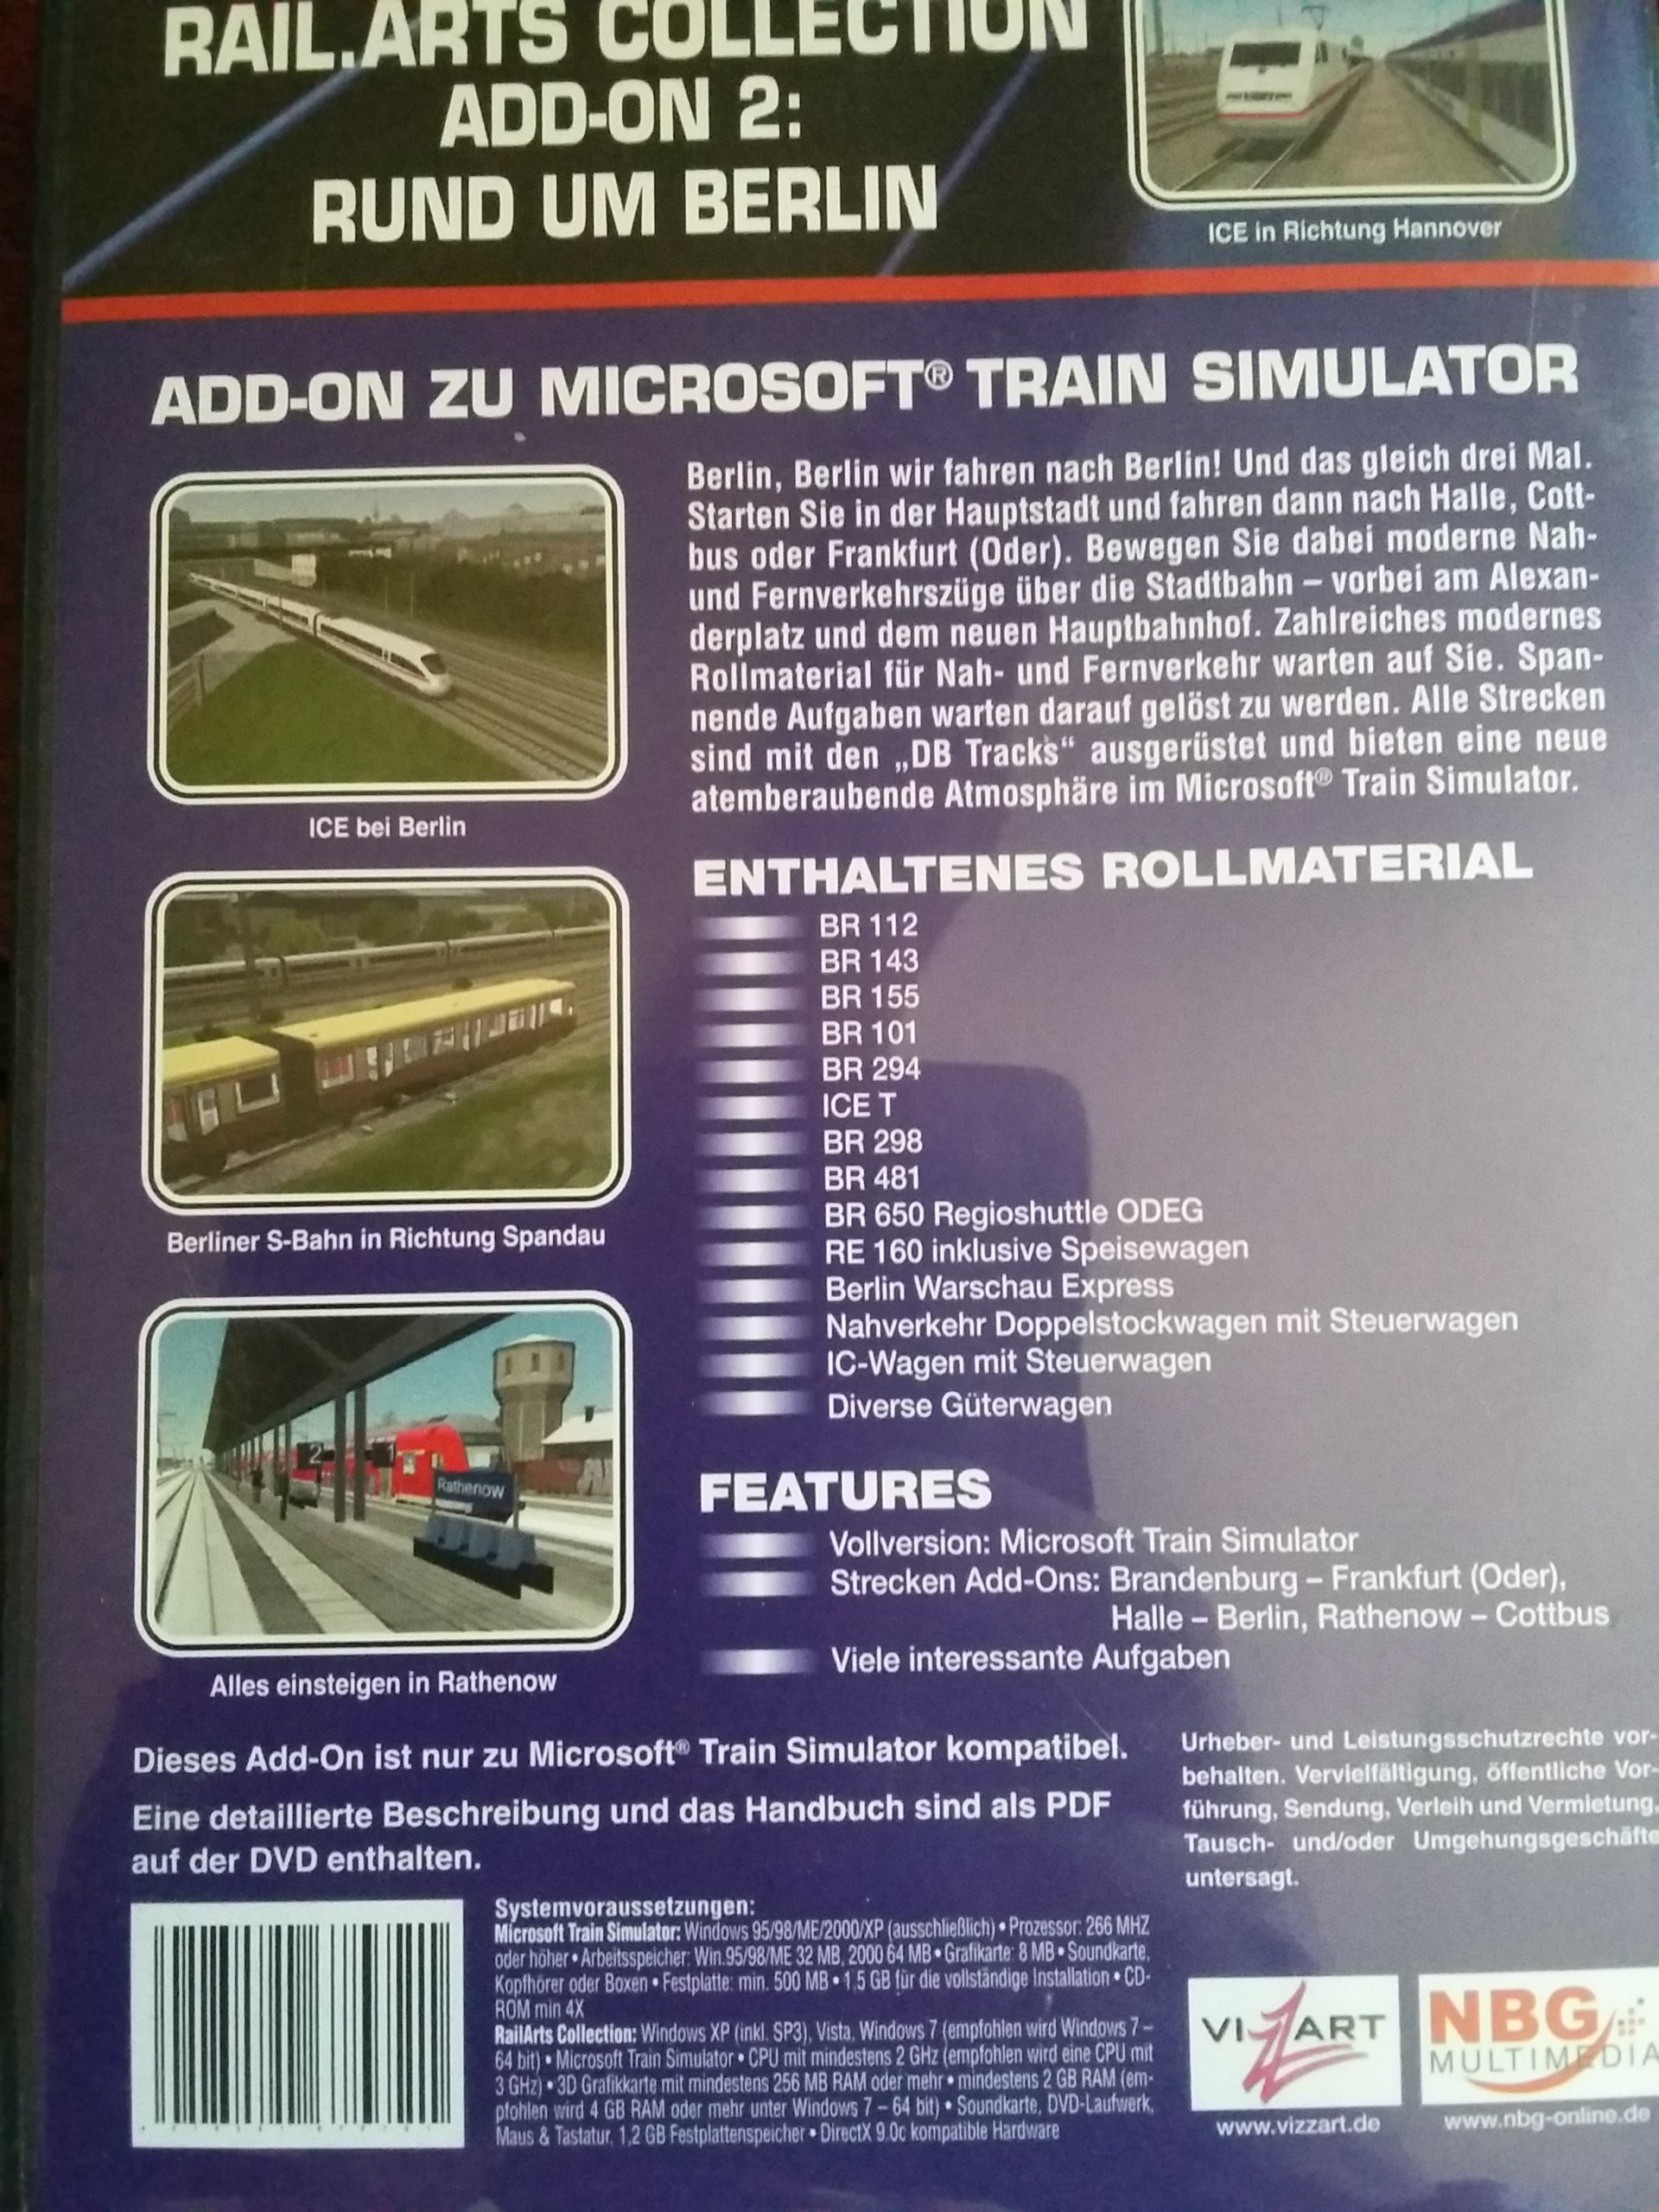 PC DVD-ROM RUND UM BERLIN PLUS MS TRAIN SIMULATOR!